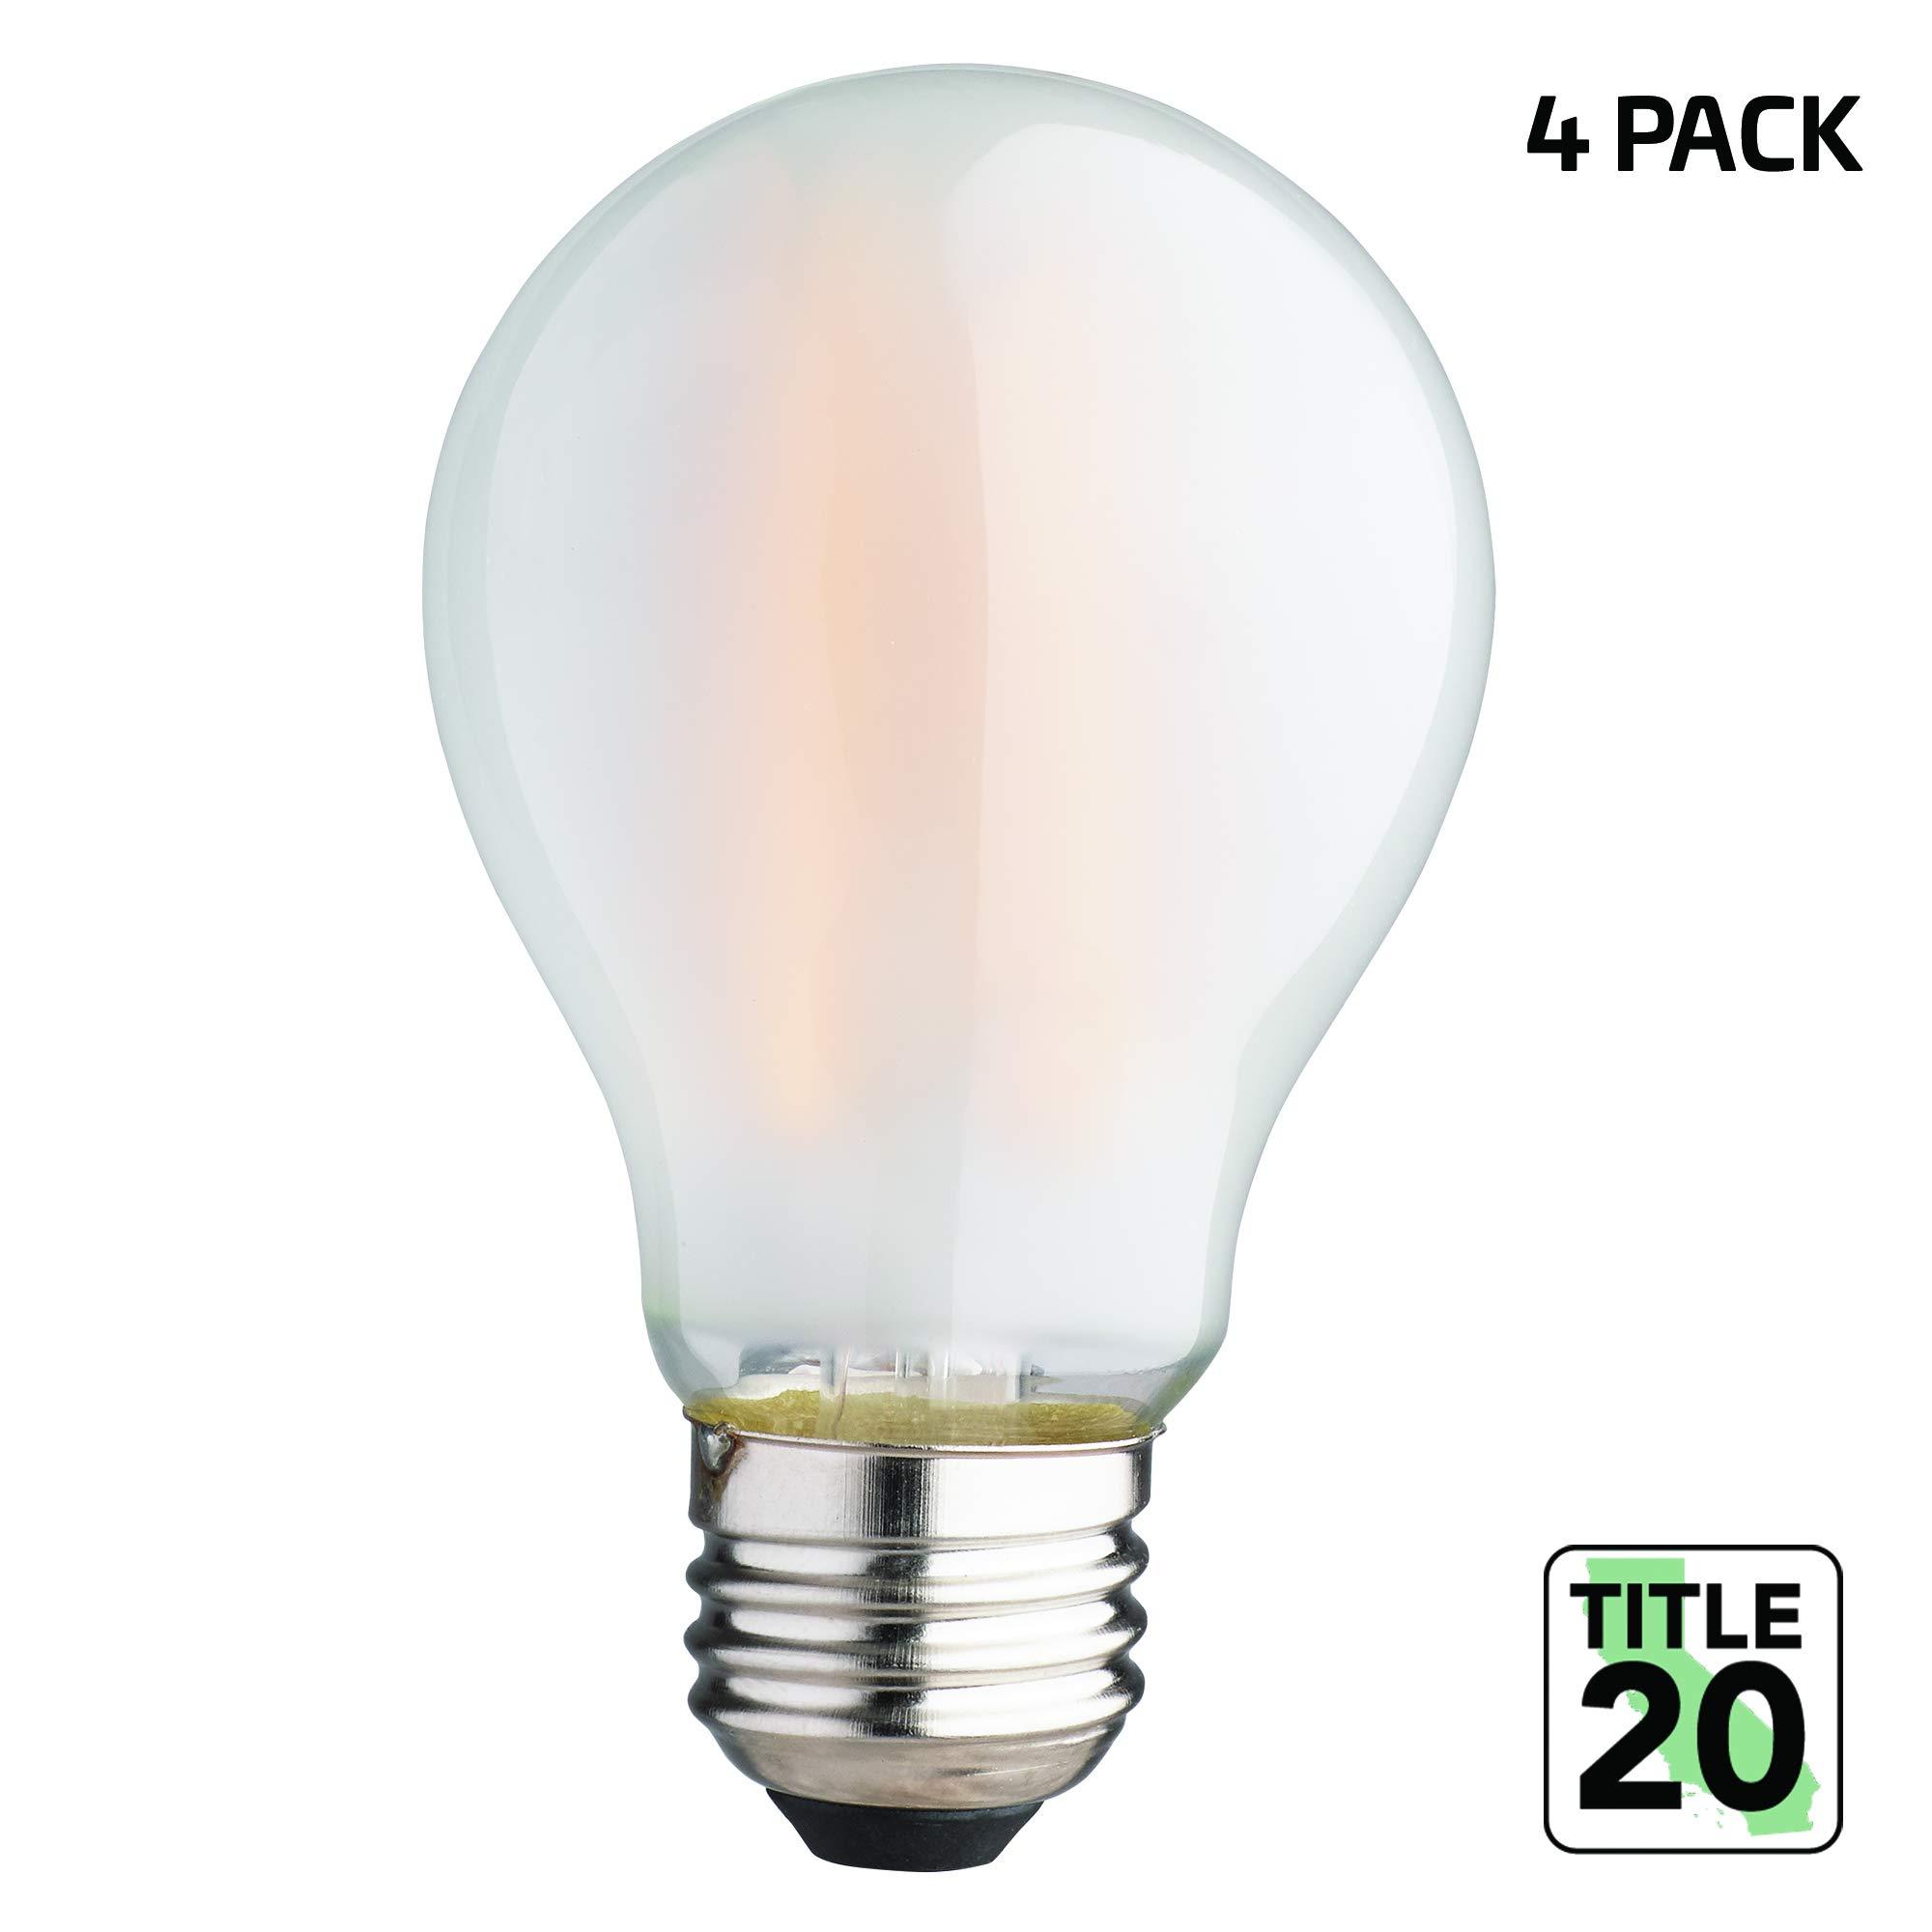 Newhouse Lighting NHLB-LED-4A19 750 Lumen A19 LED, 90 CRI, Warm White, E26 Base, Title 20 Compliant, Shatterproof Bulb, 4-Pack